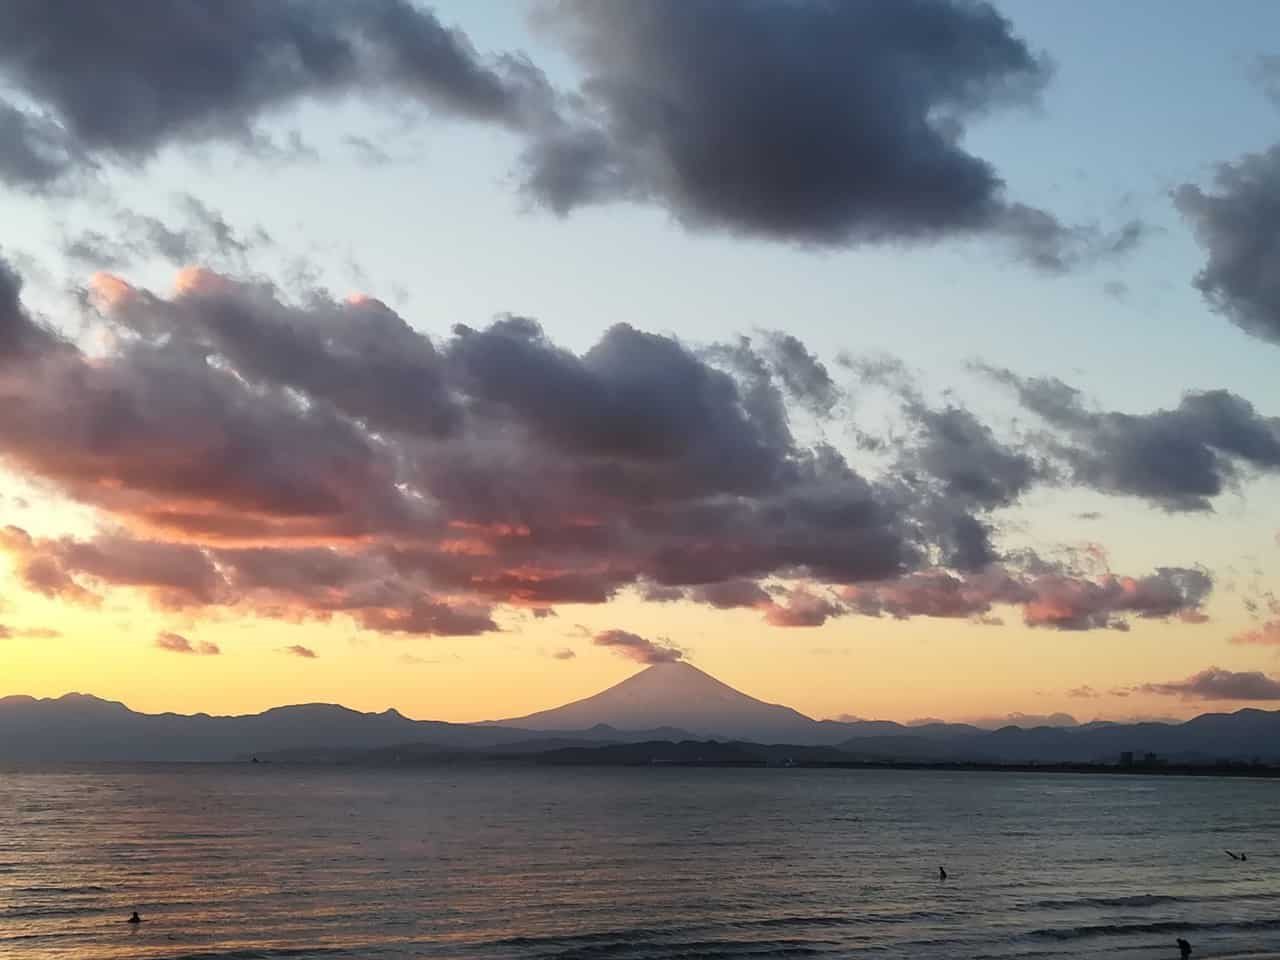 Excursions depuis Tokyo : Hakone, Enoshima et Oyama en train par les lignes Odakyu